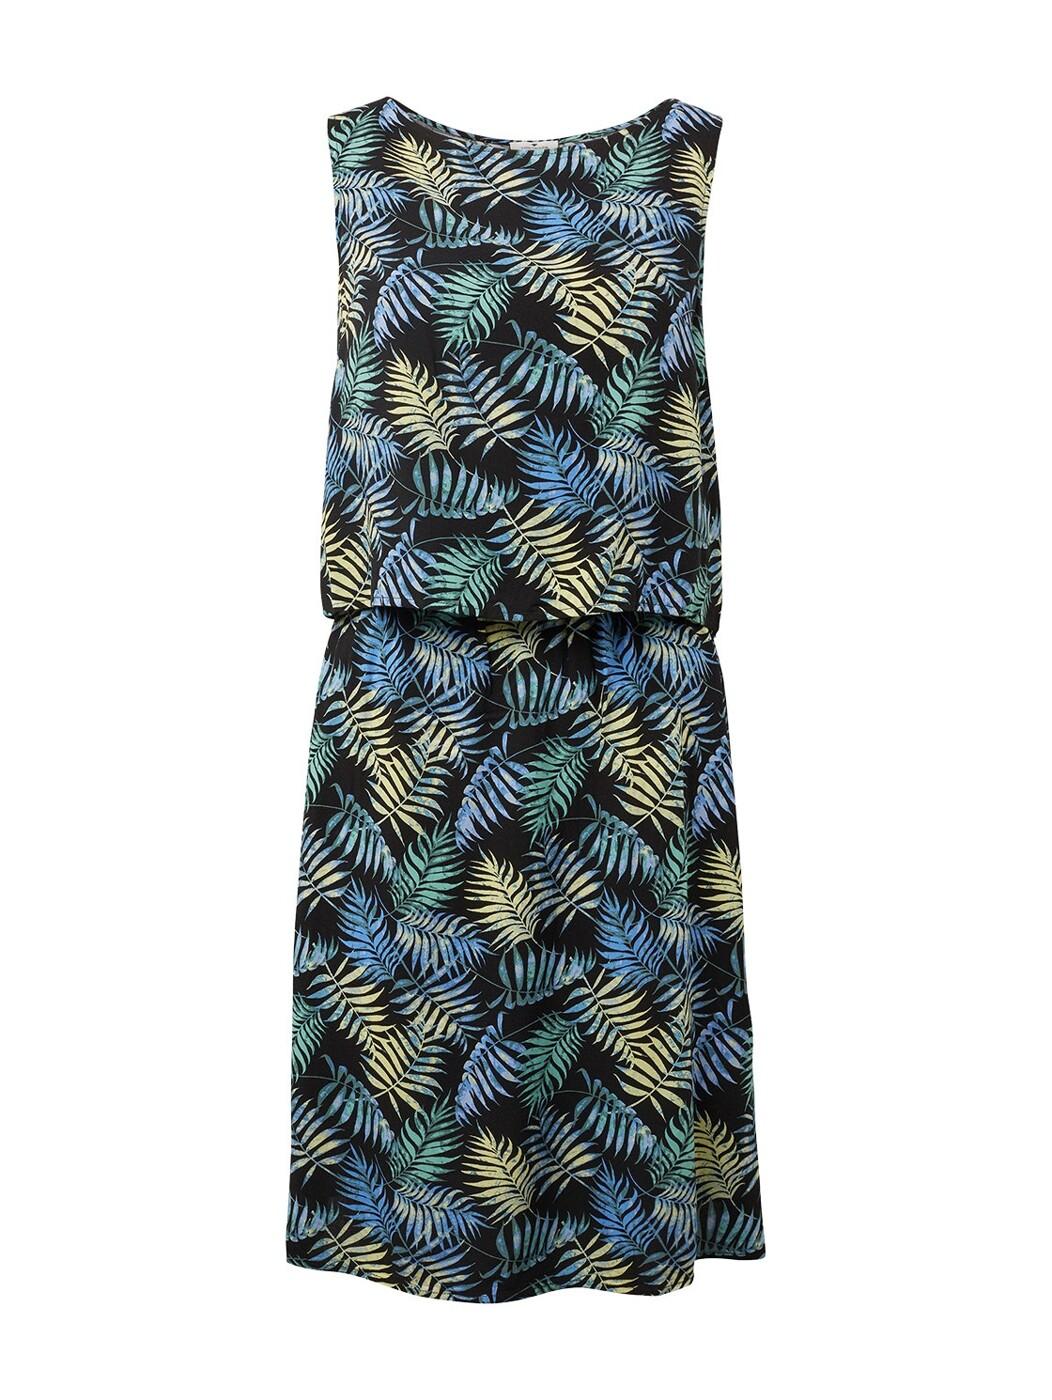 2 in 1 print dress - Damen